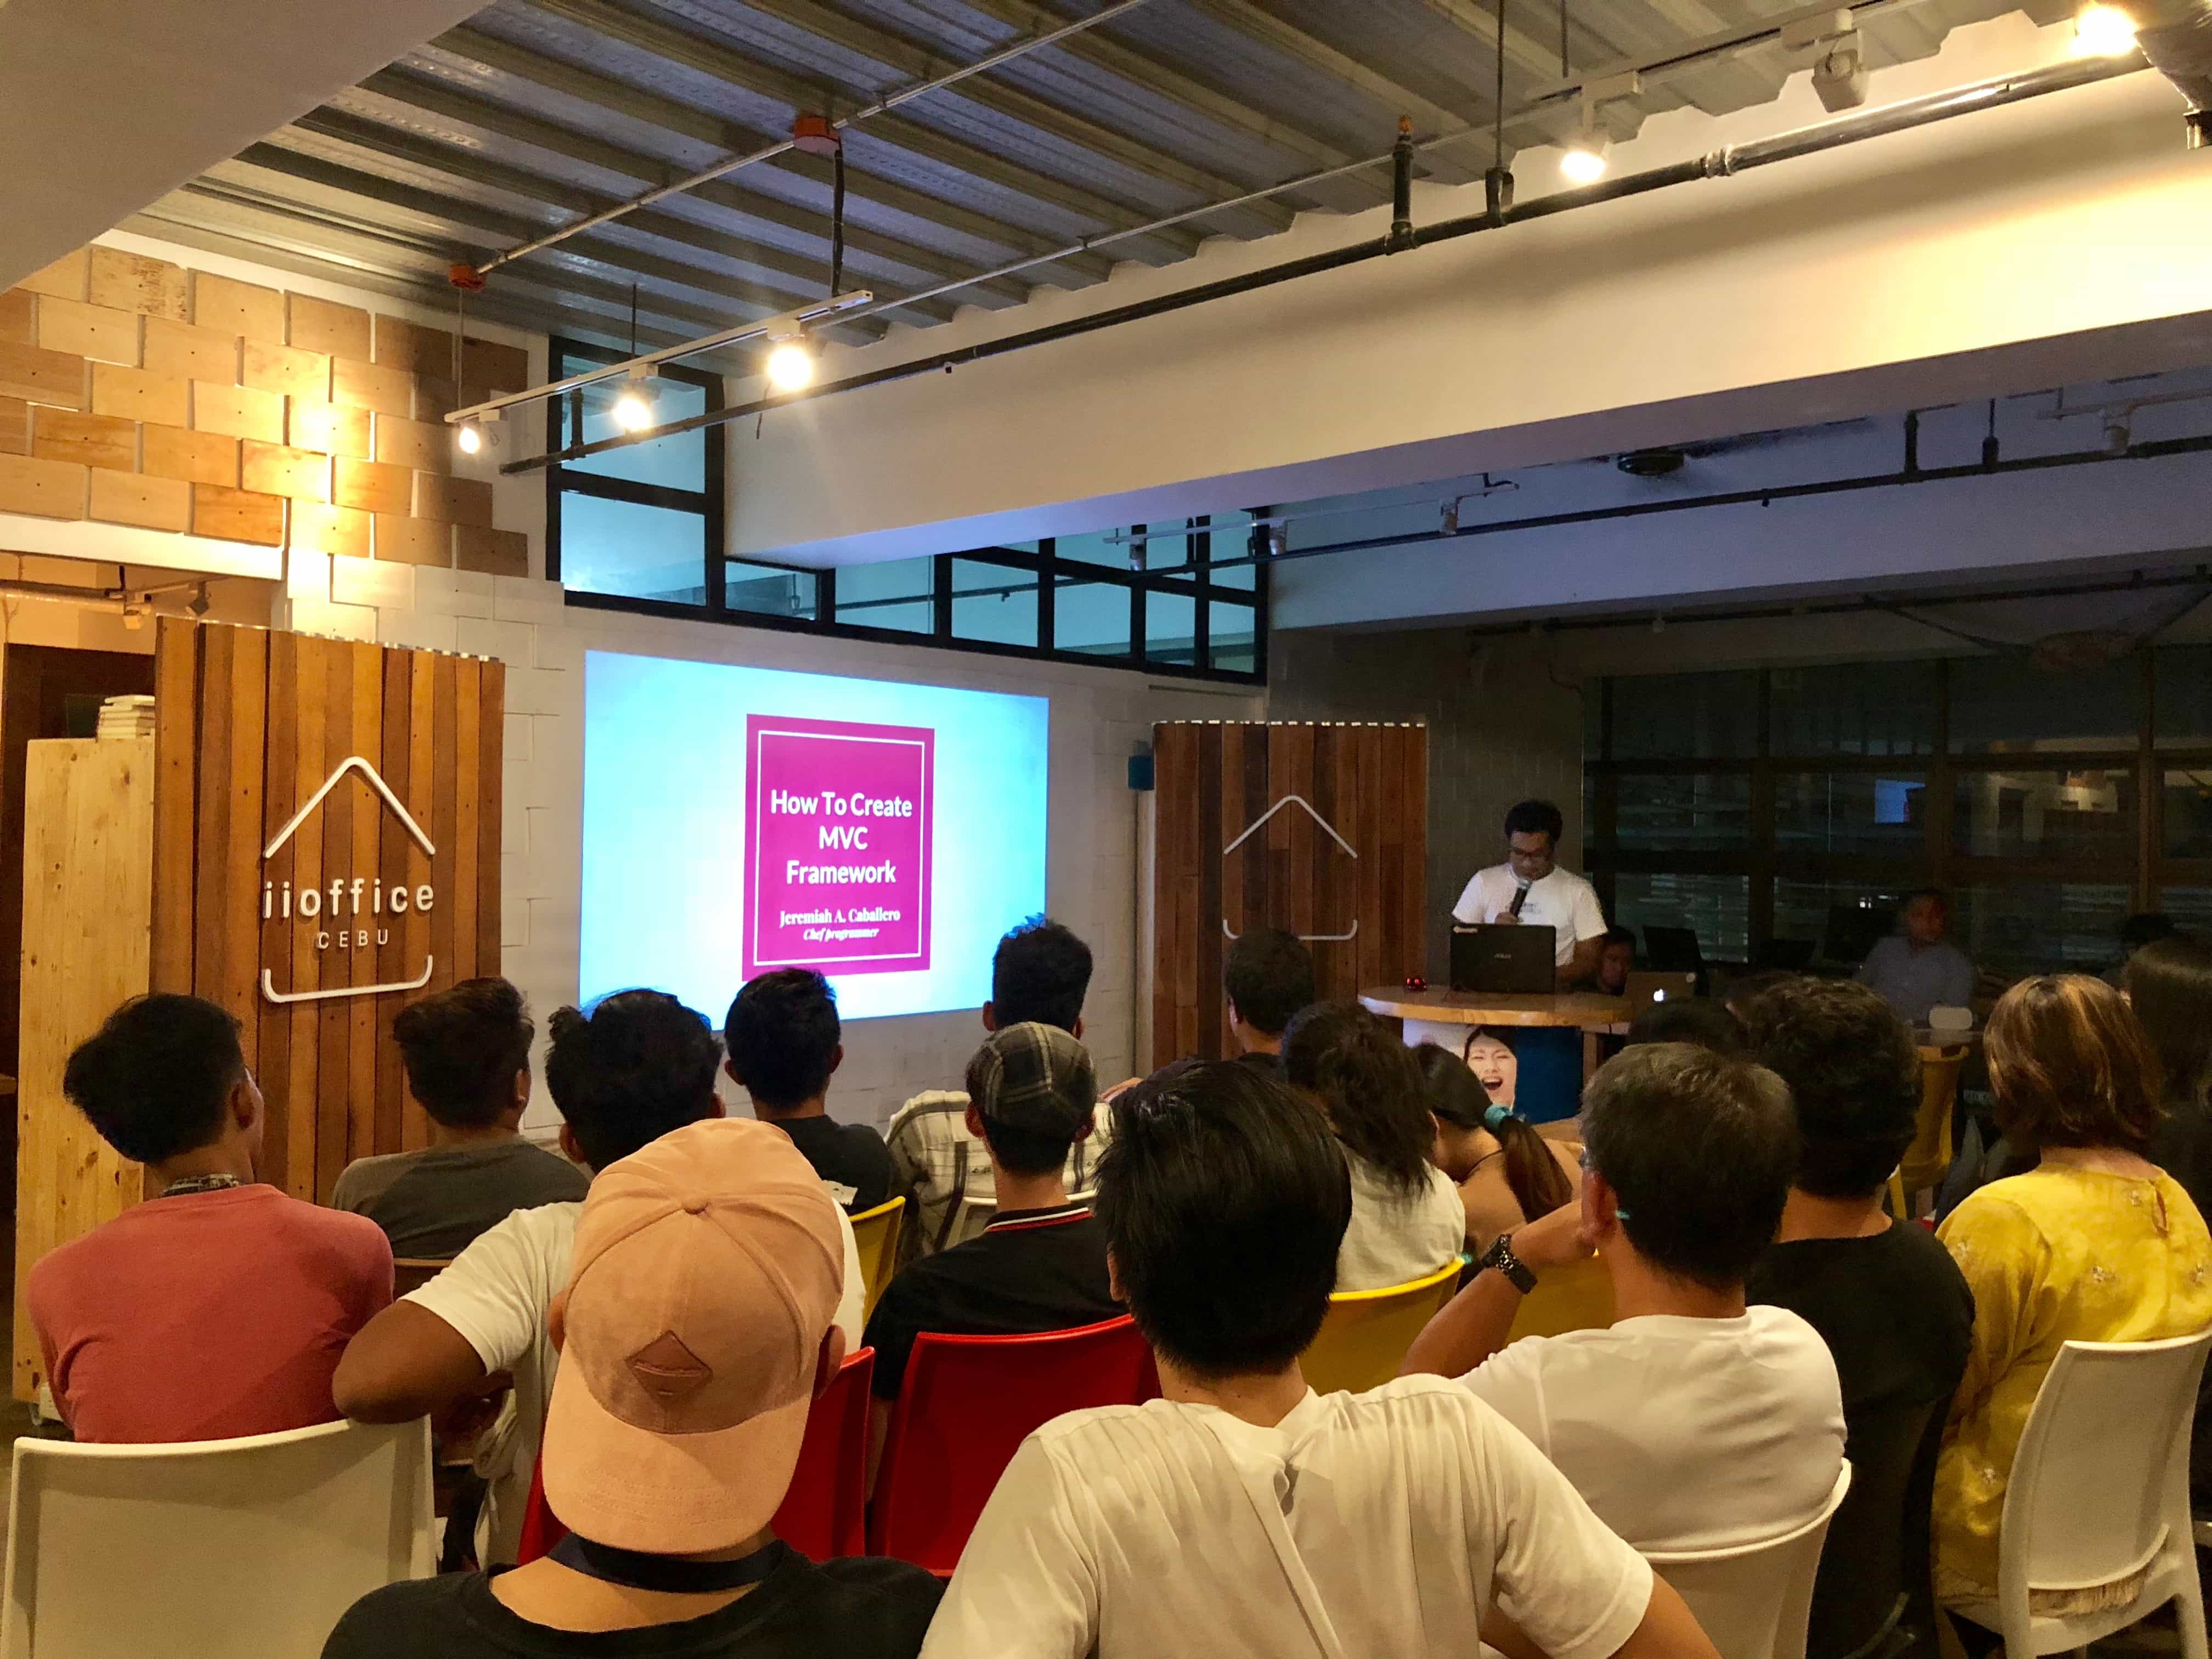 LIG PHの勉強会イベント「HTML CEBU」でフランジアの講師さんが登壇している様子